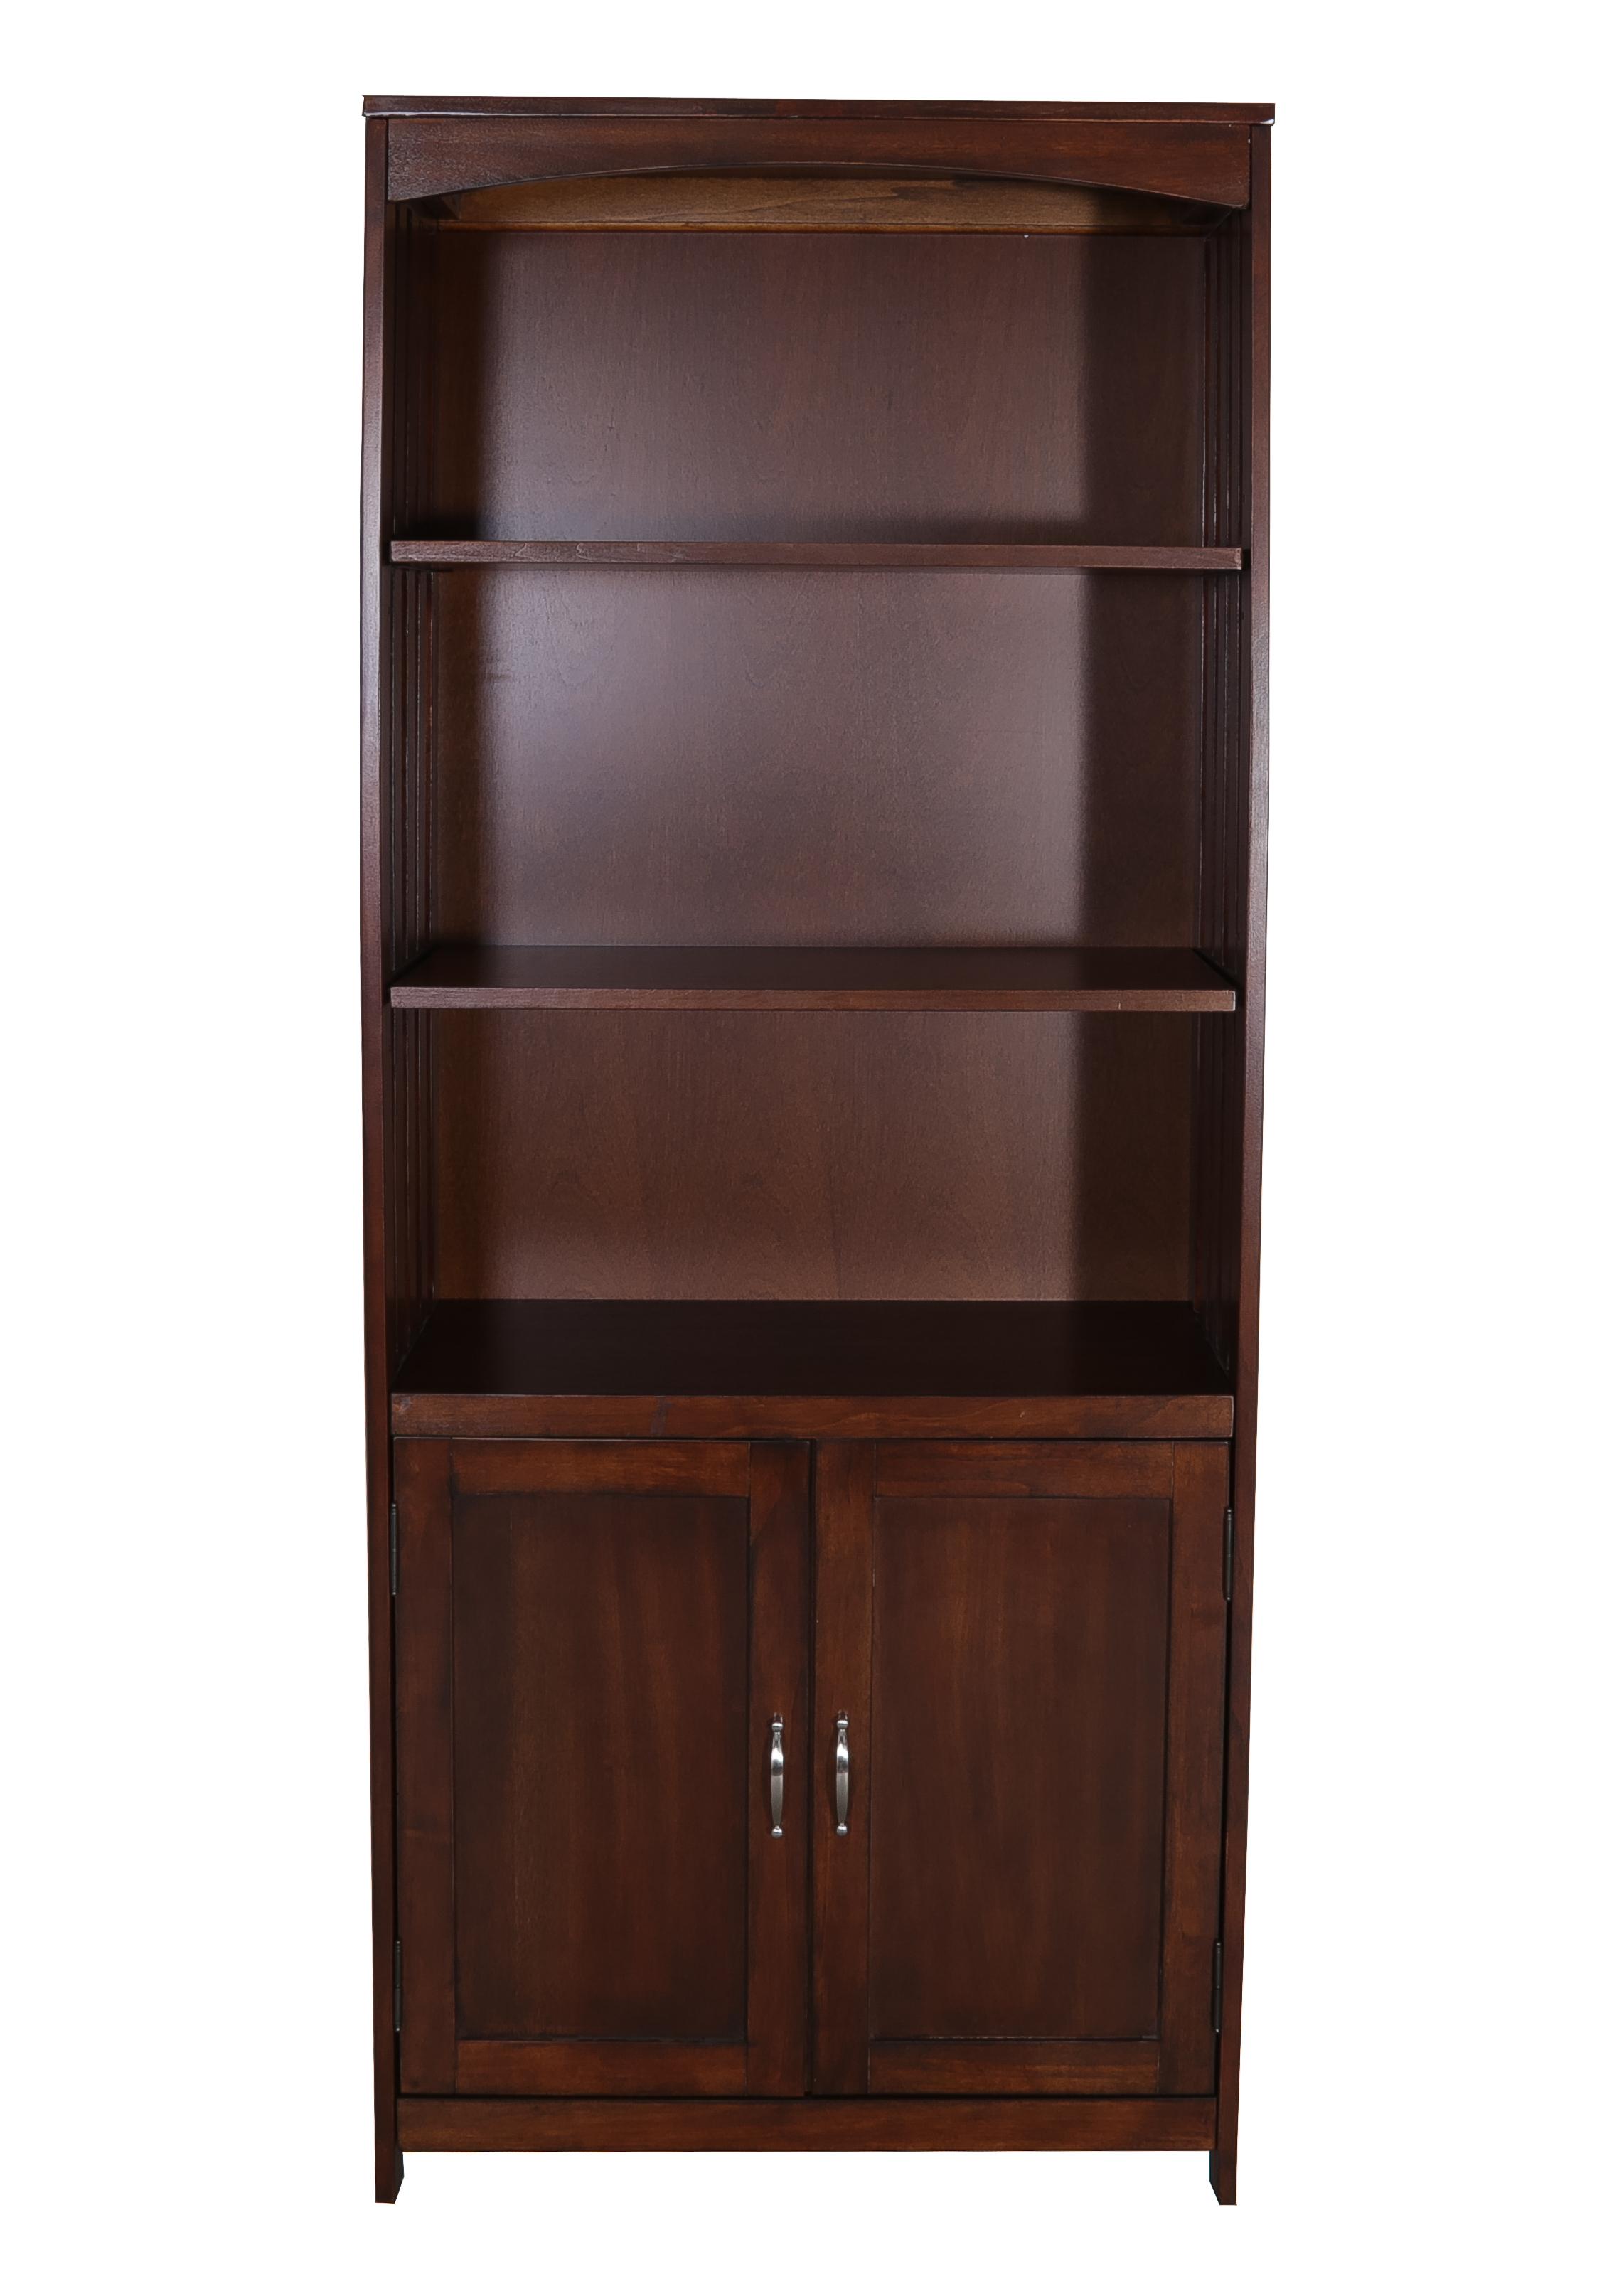 Liberty Furniture Hampton Bay  Door Bookcase                                - Item Number: 718-HO202